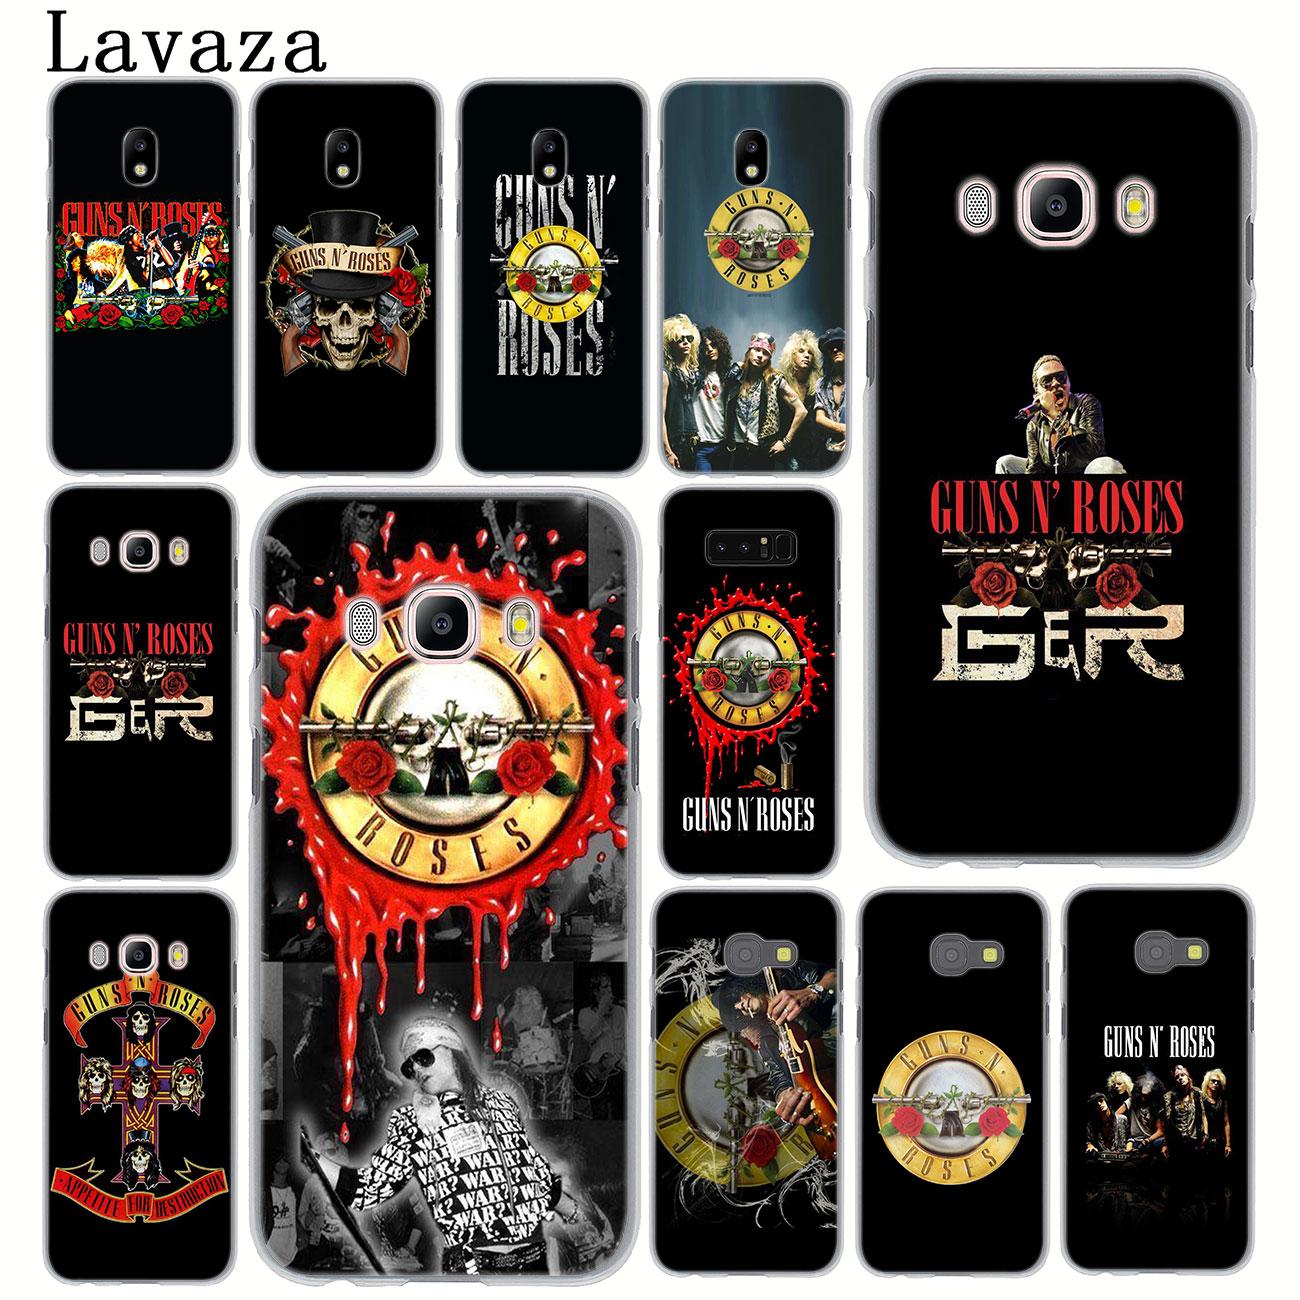 Чехол для телефона Lavaza guns n roses guns N Roses для samsung Galaxy J8 J7 Duo J4 J5 J6 Plus 2018 2017 2016 J2 J3 Prime 2015